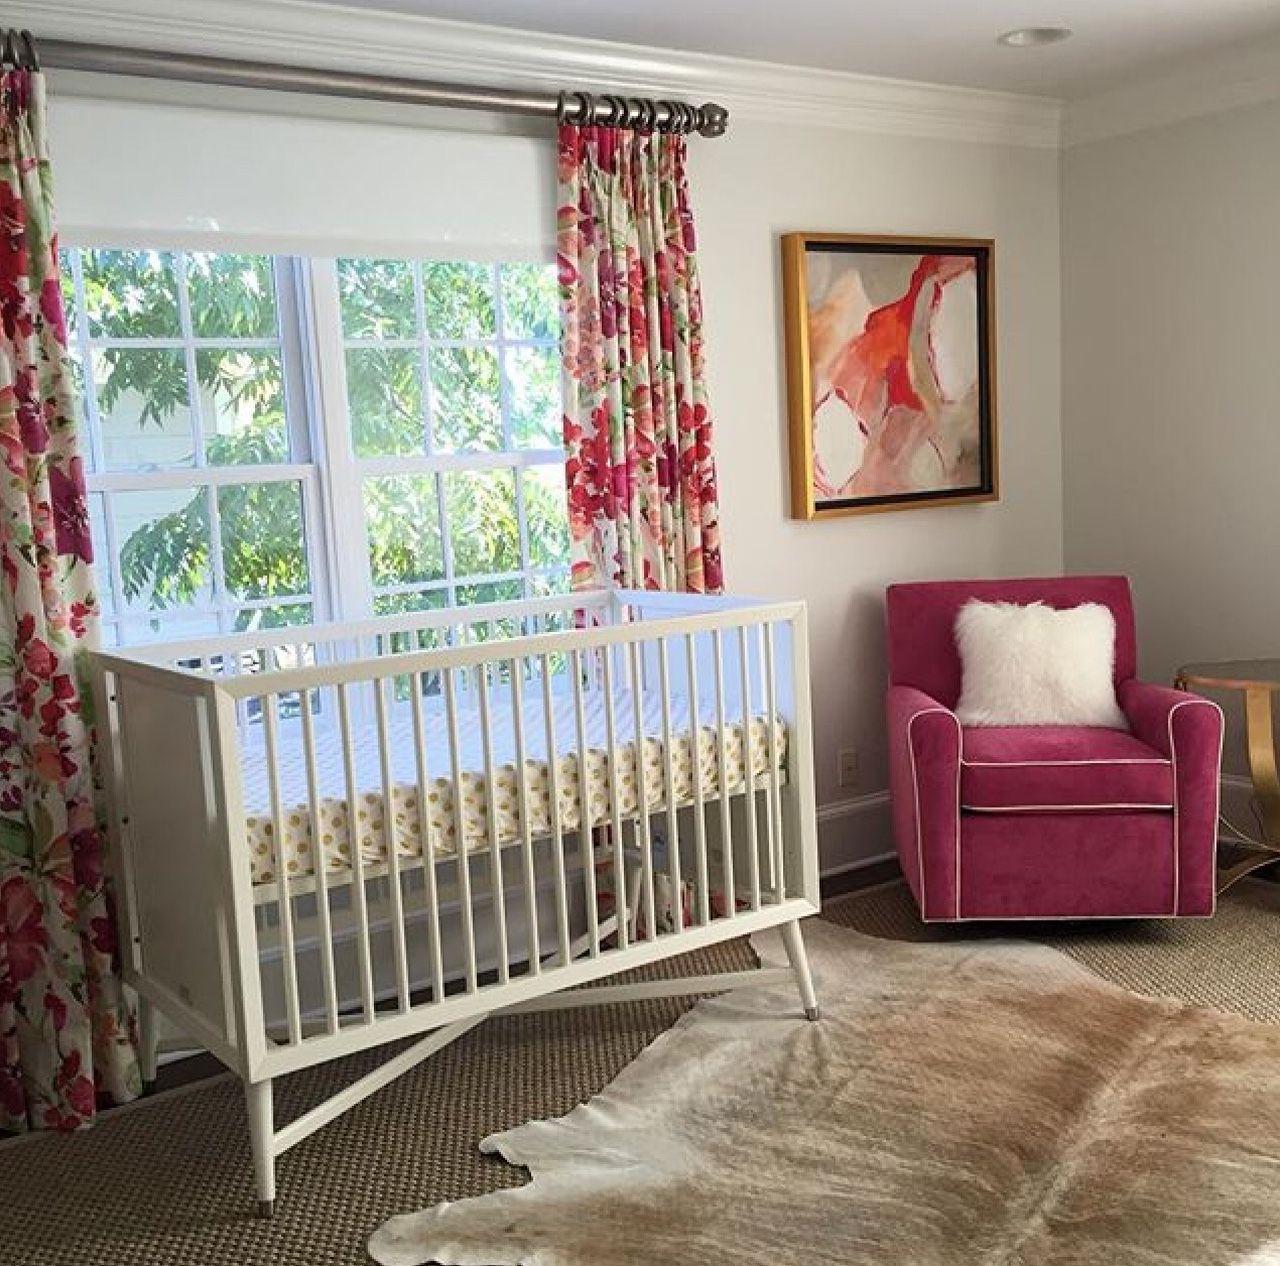 Loving This Beautiful Nursery Designed By Clark Interiors Charlotte Nc Using